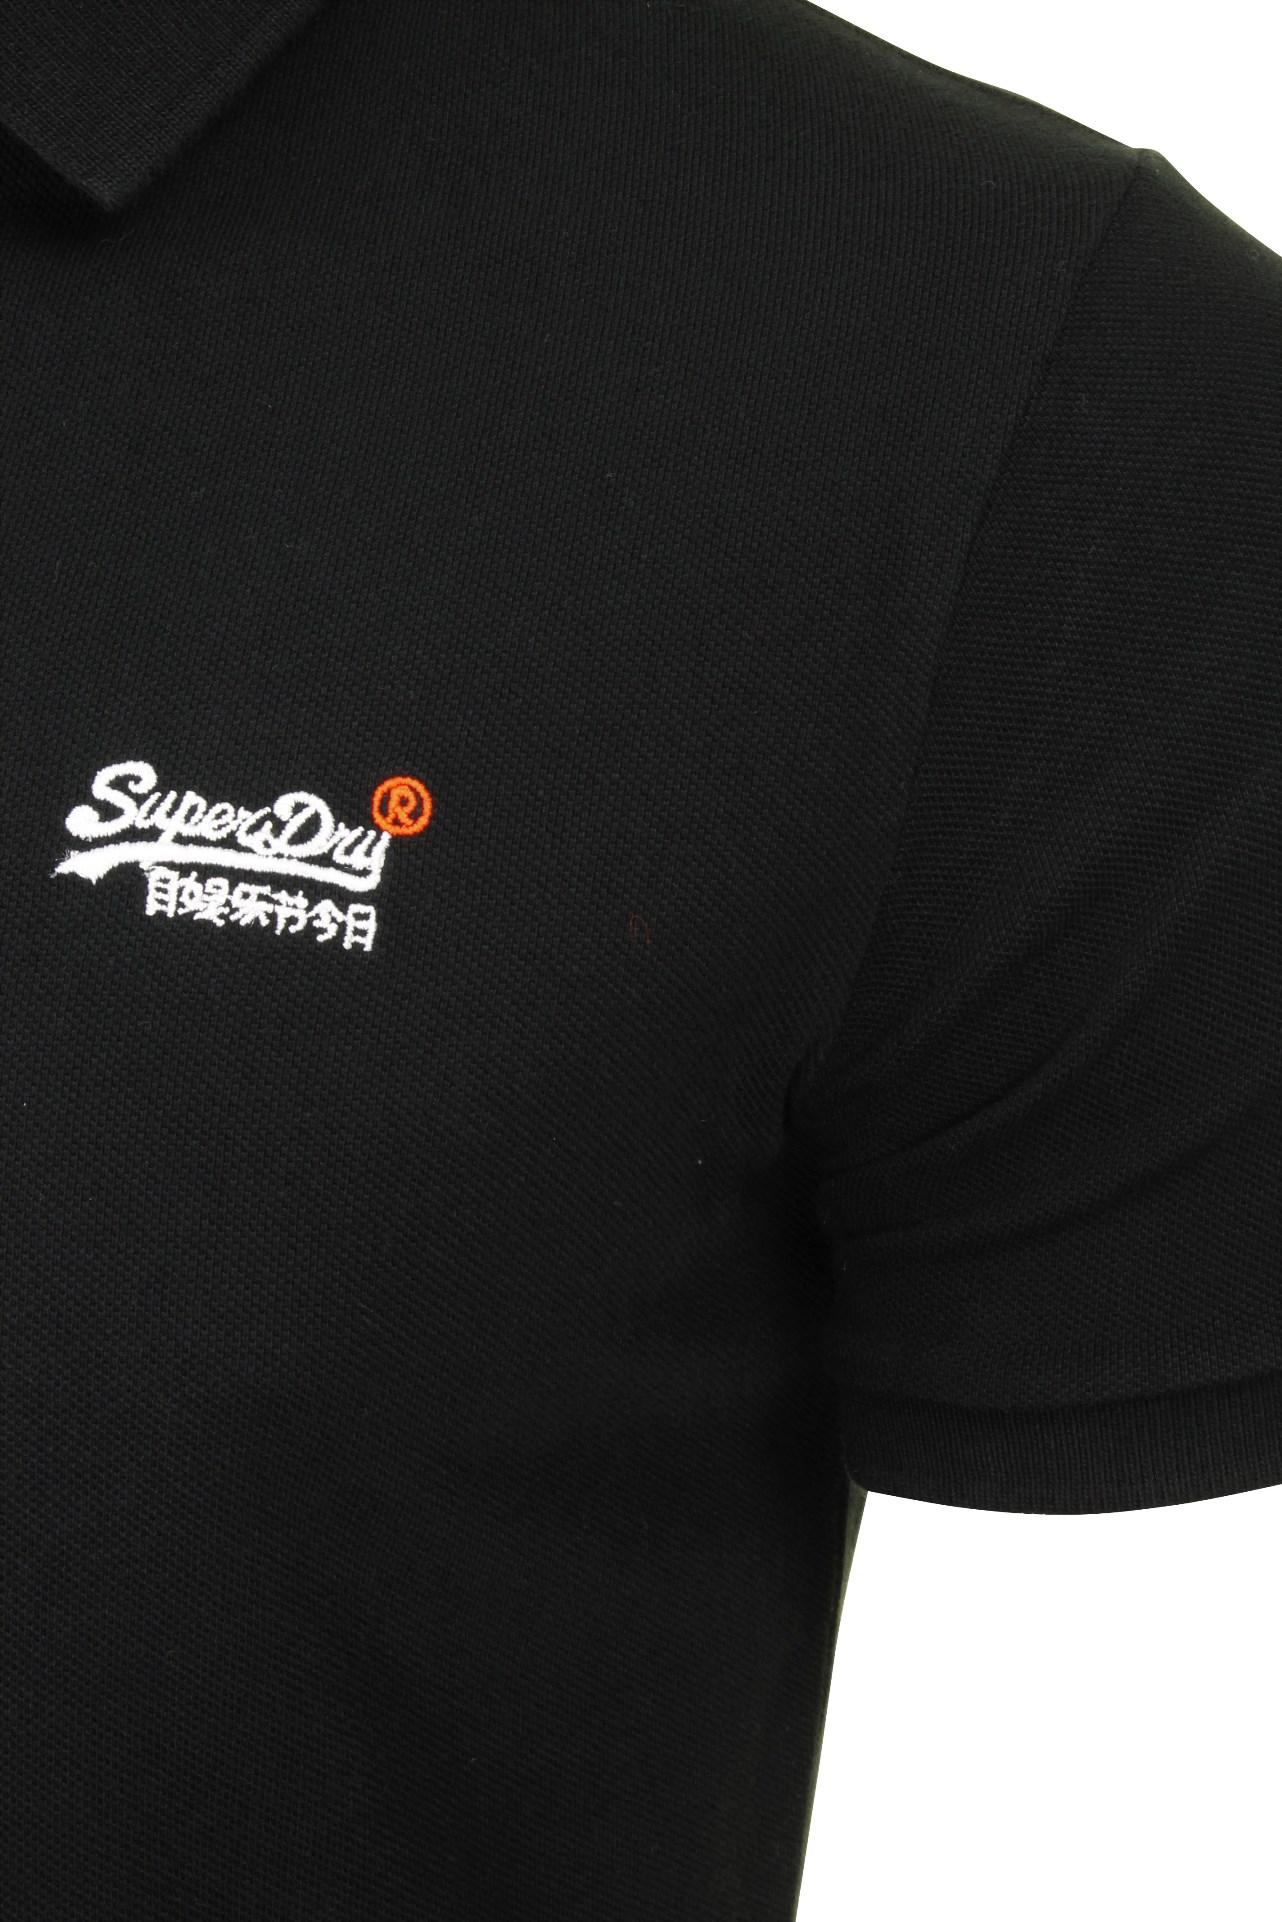 Camisa-clasica-para-hombre-039-Camiseta-Polo-Pique-039 miniatura 4